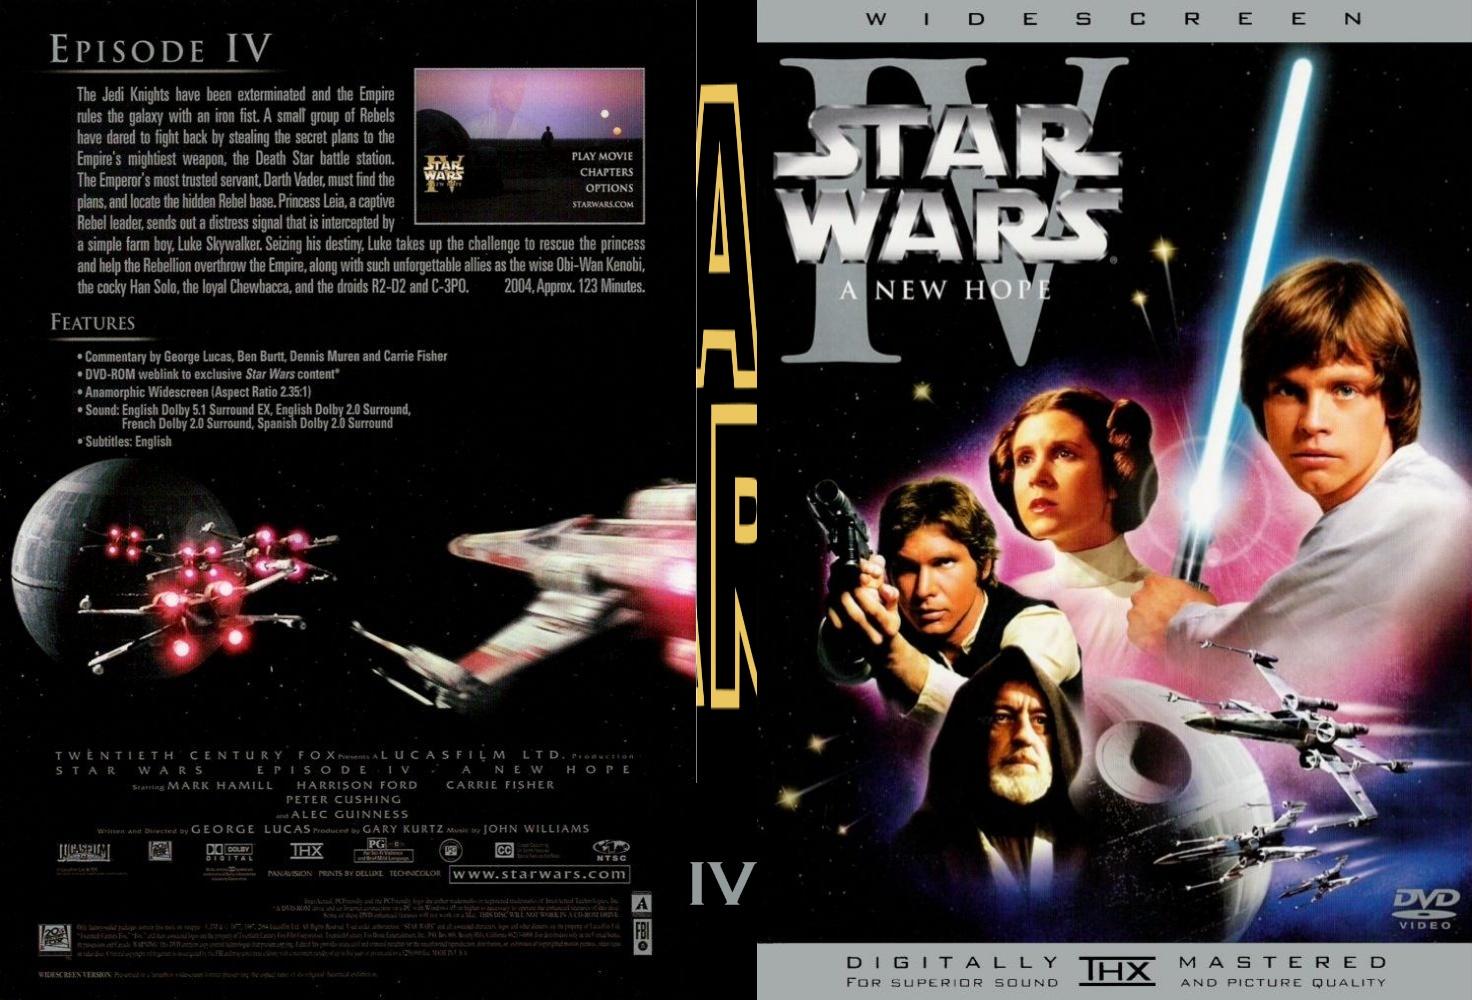 star wars episode 4 subtitles download